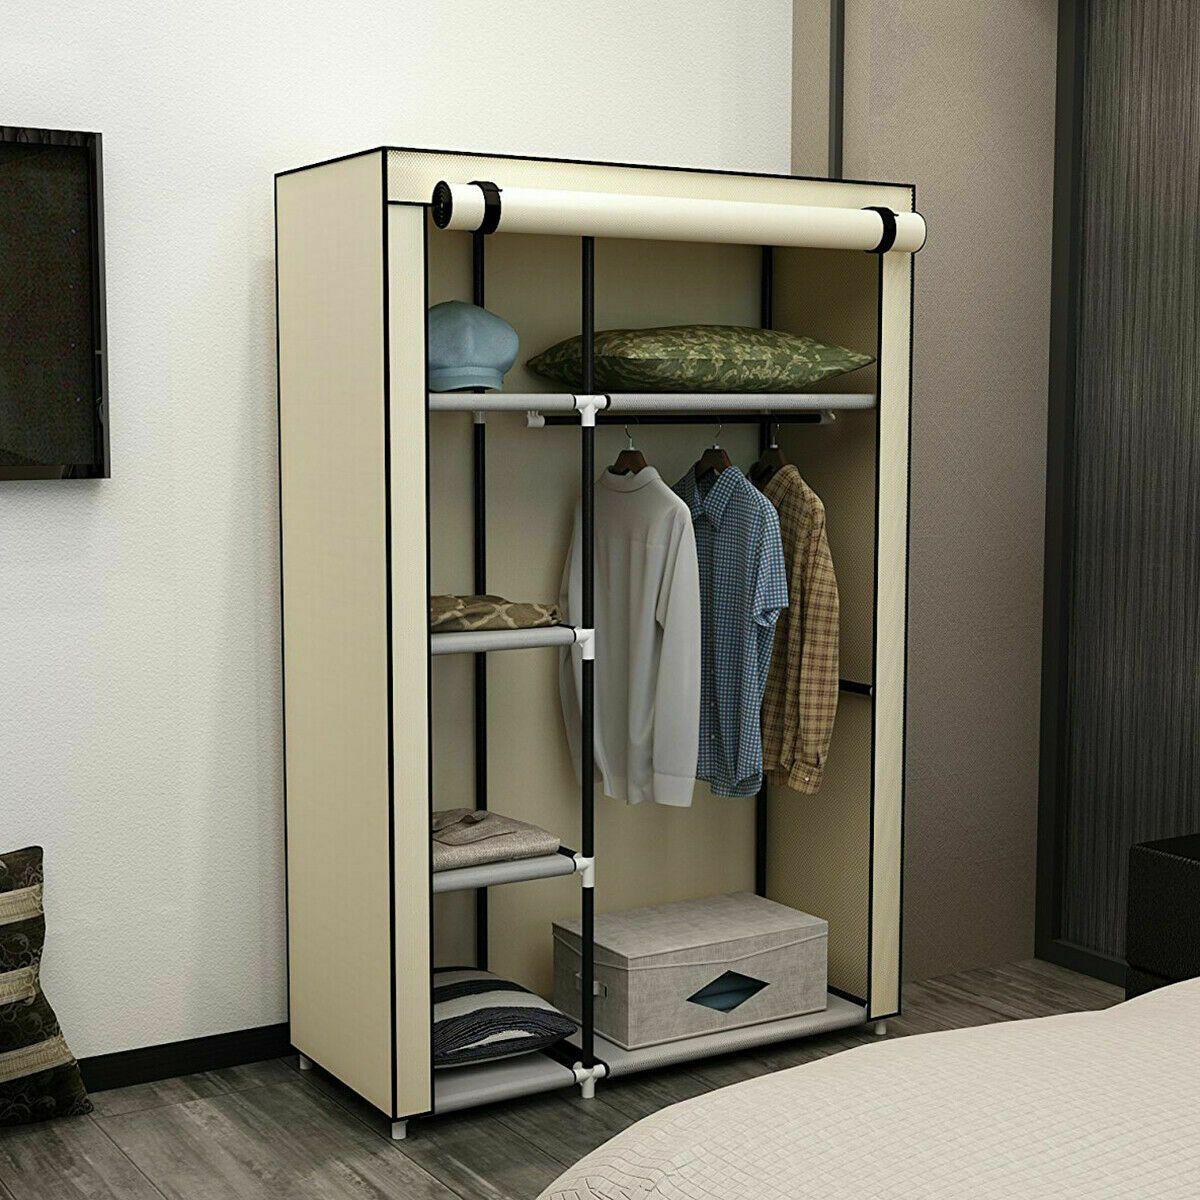 63 Portable Closet Storage Shelves Clothes Fabric Wardrobe